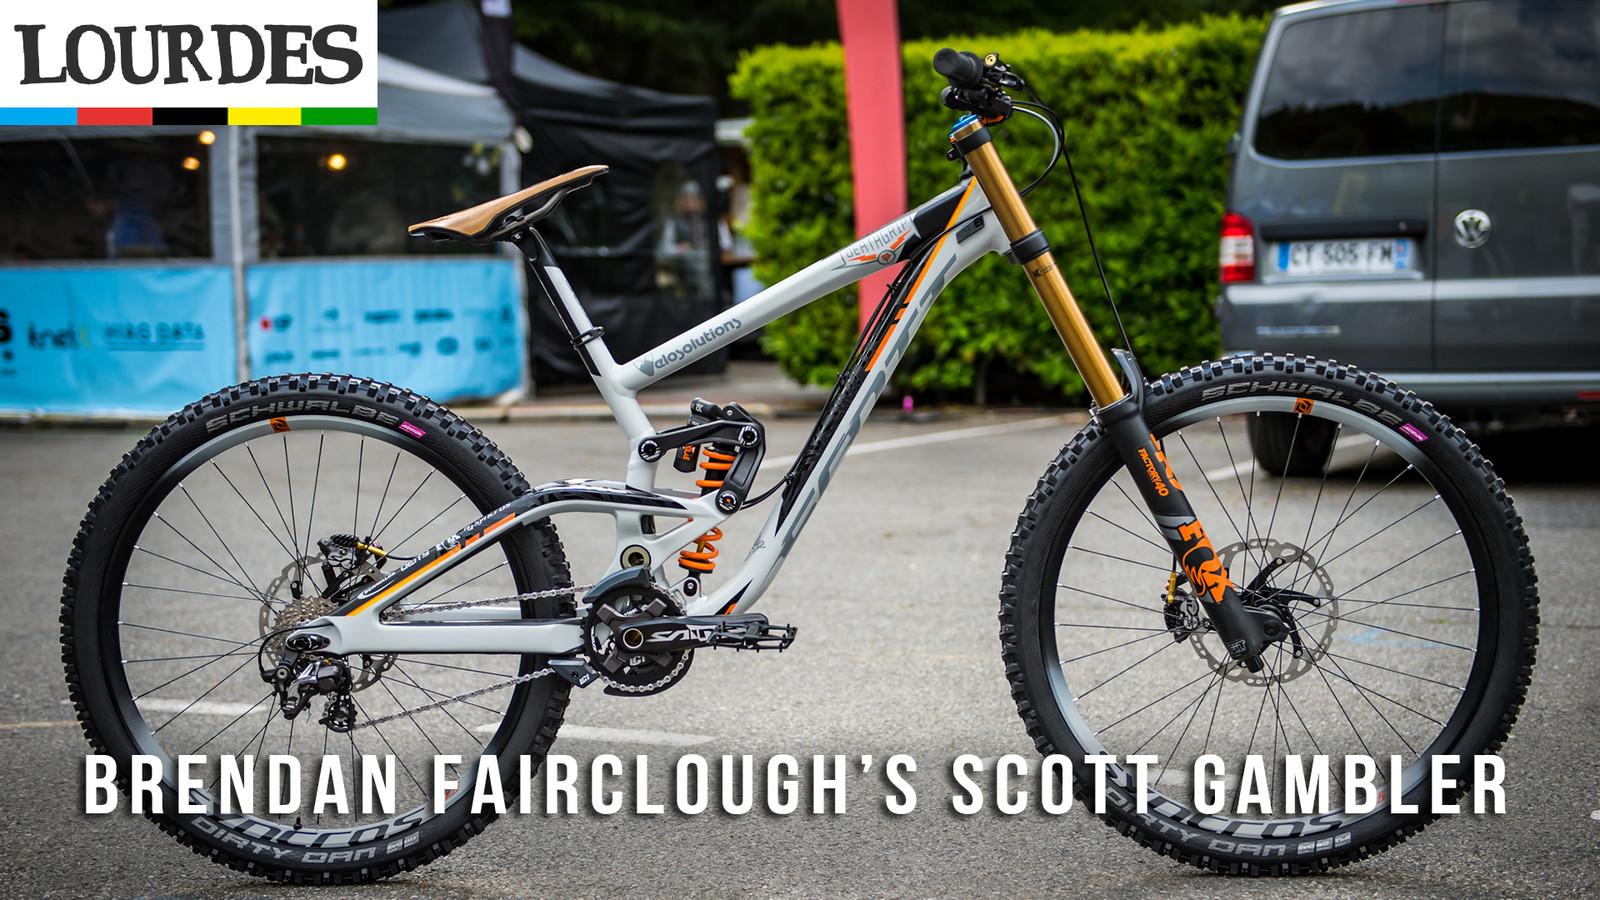 Brendan Fairclough's Scott Gambler